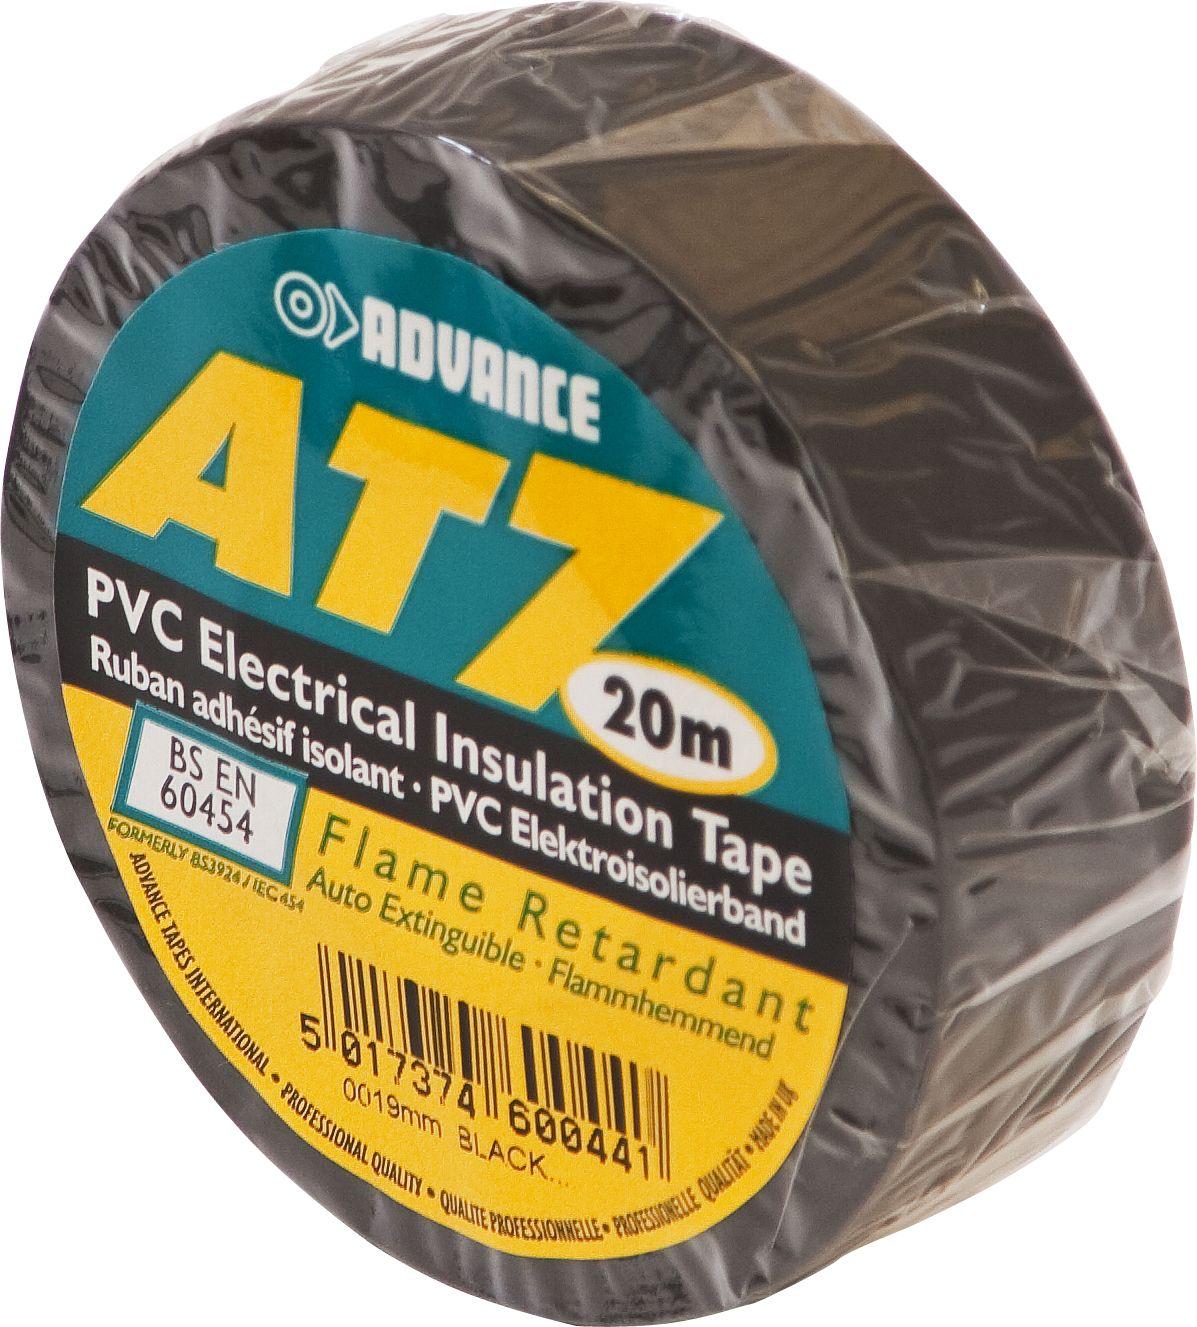 Adhesif isolant noir Advance AT7 15mm X 10m type barnier